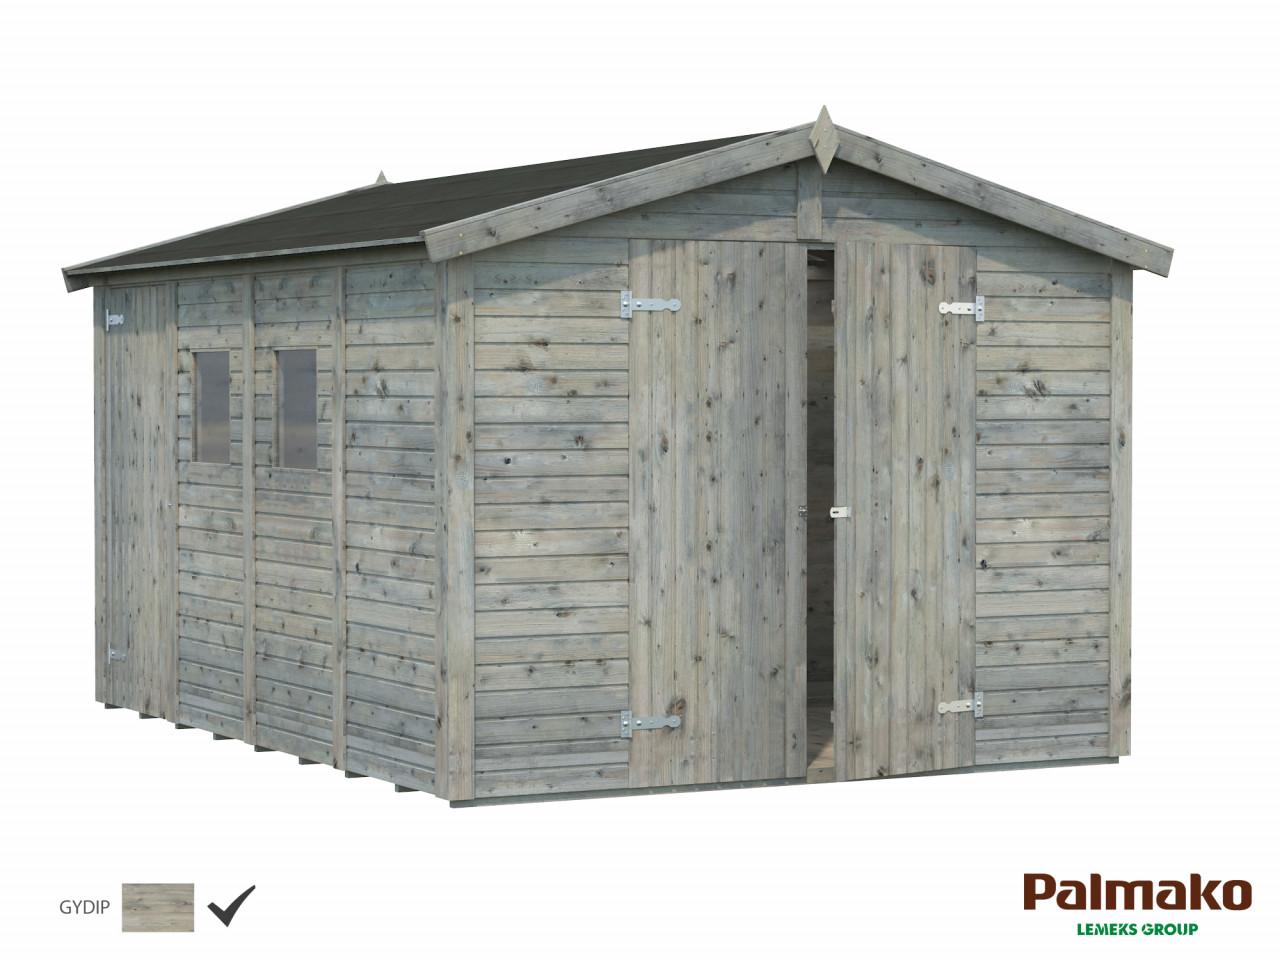 Palmako Gerätehaus Dan 9,9 m²